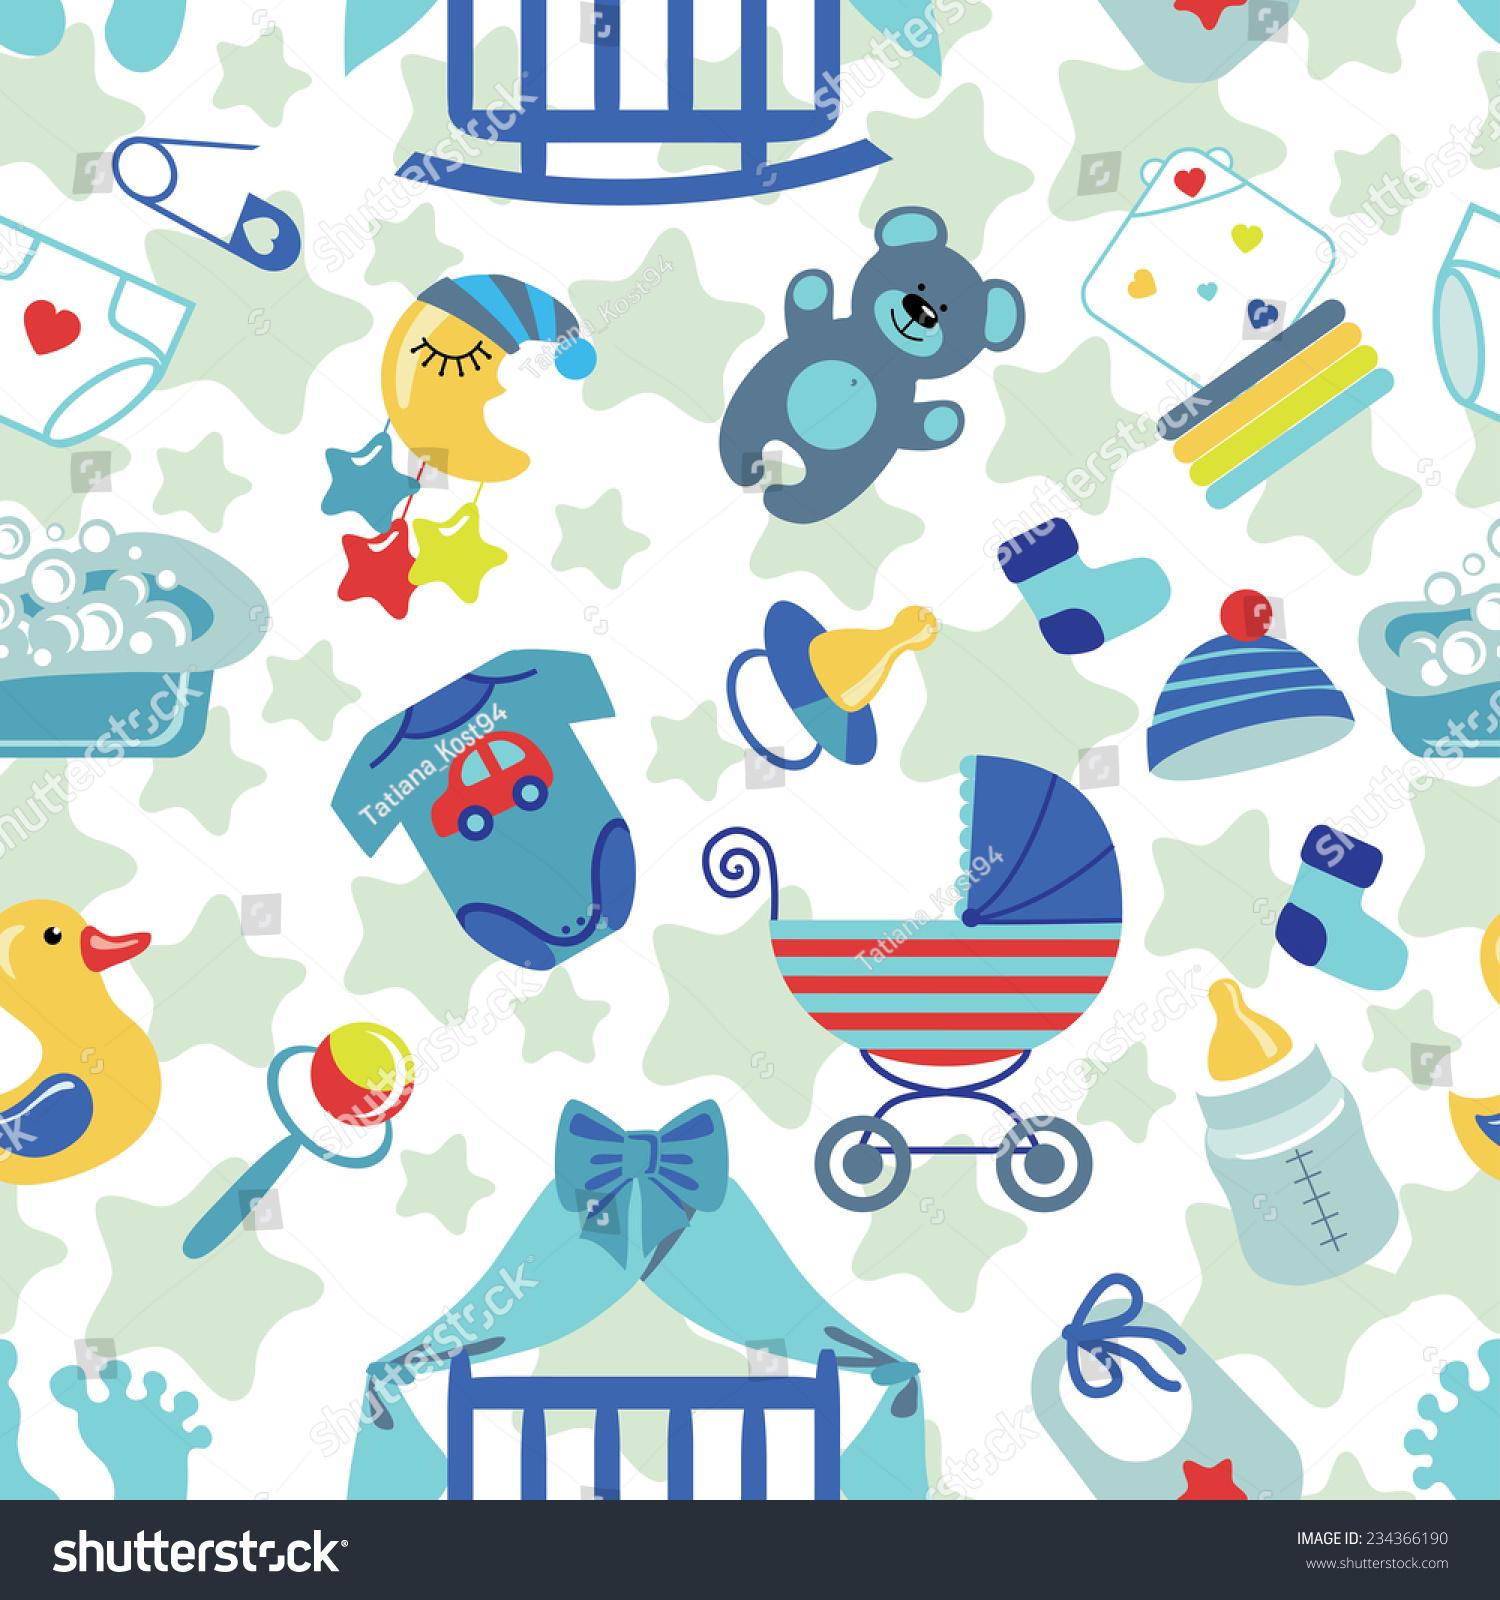 Cute Newborn Seamless Pattern Baby Boybaby Stock Vector Royalty Free 234366190